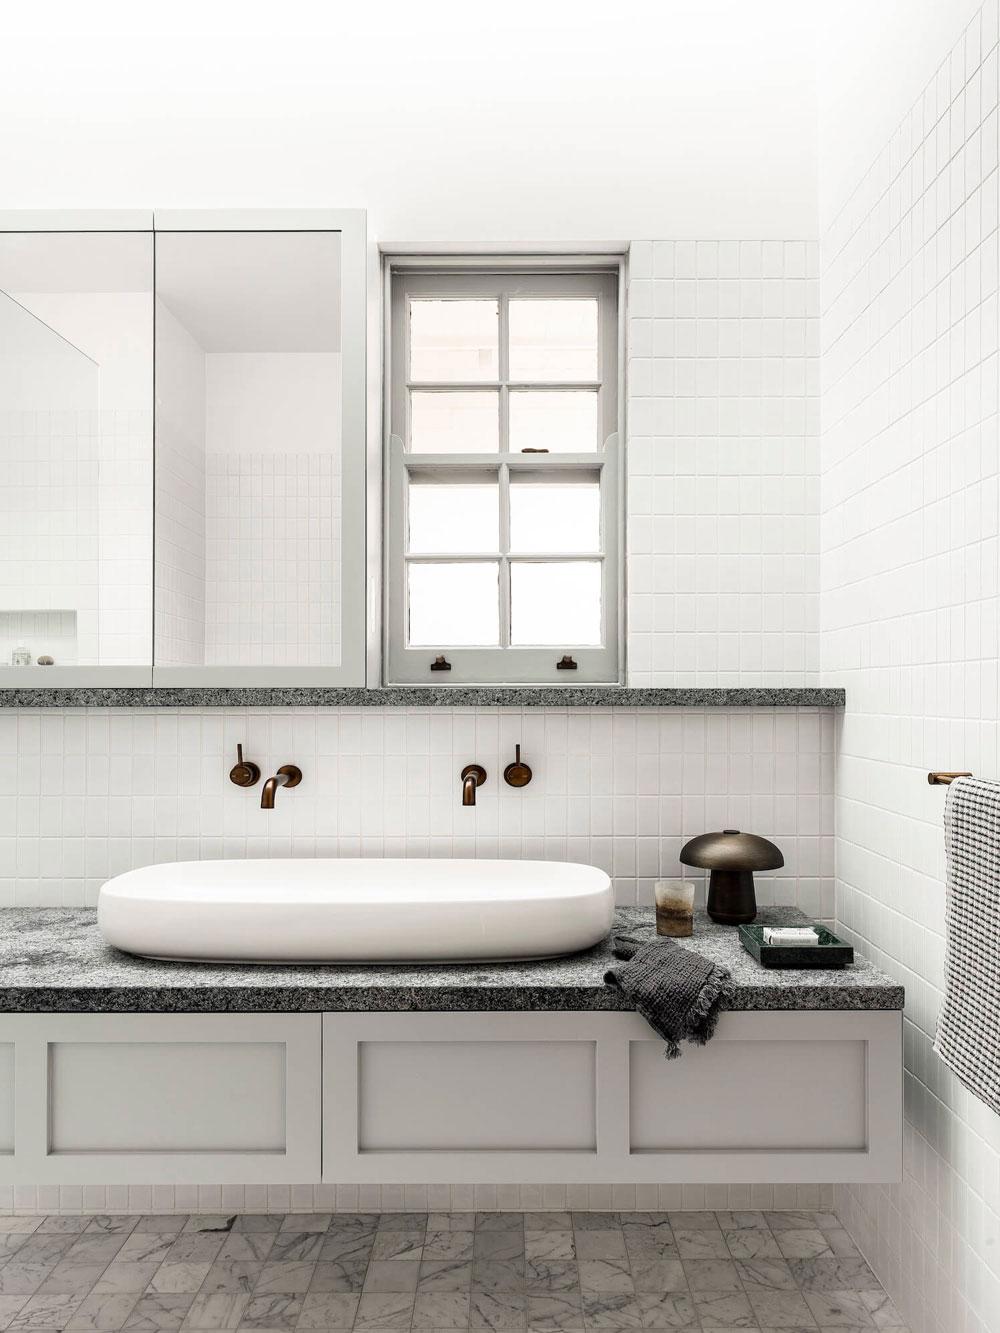 The Best Bathroom Designs of 2019